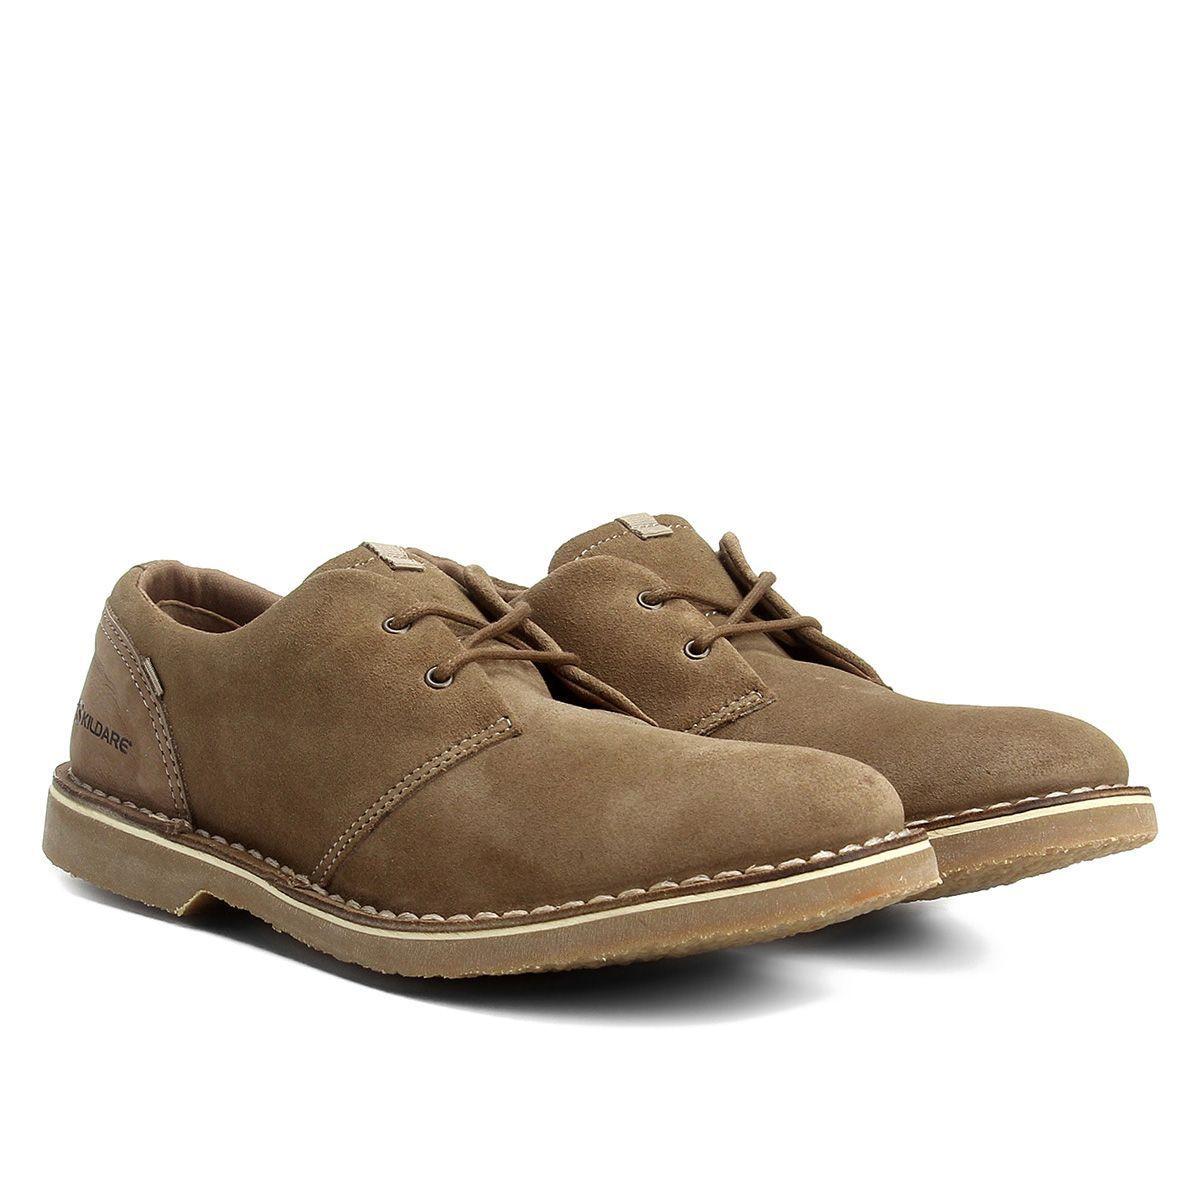 Sapato Casual Couro Kildare Sahara Camurça / Marrom Claro